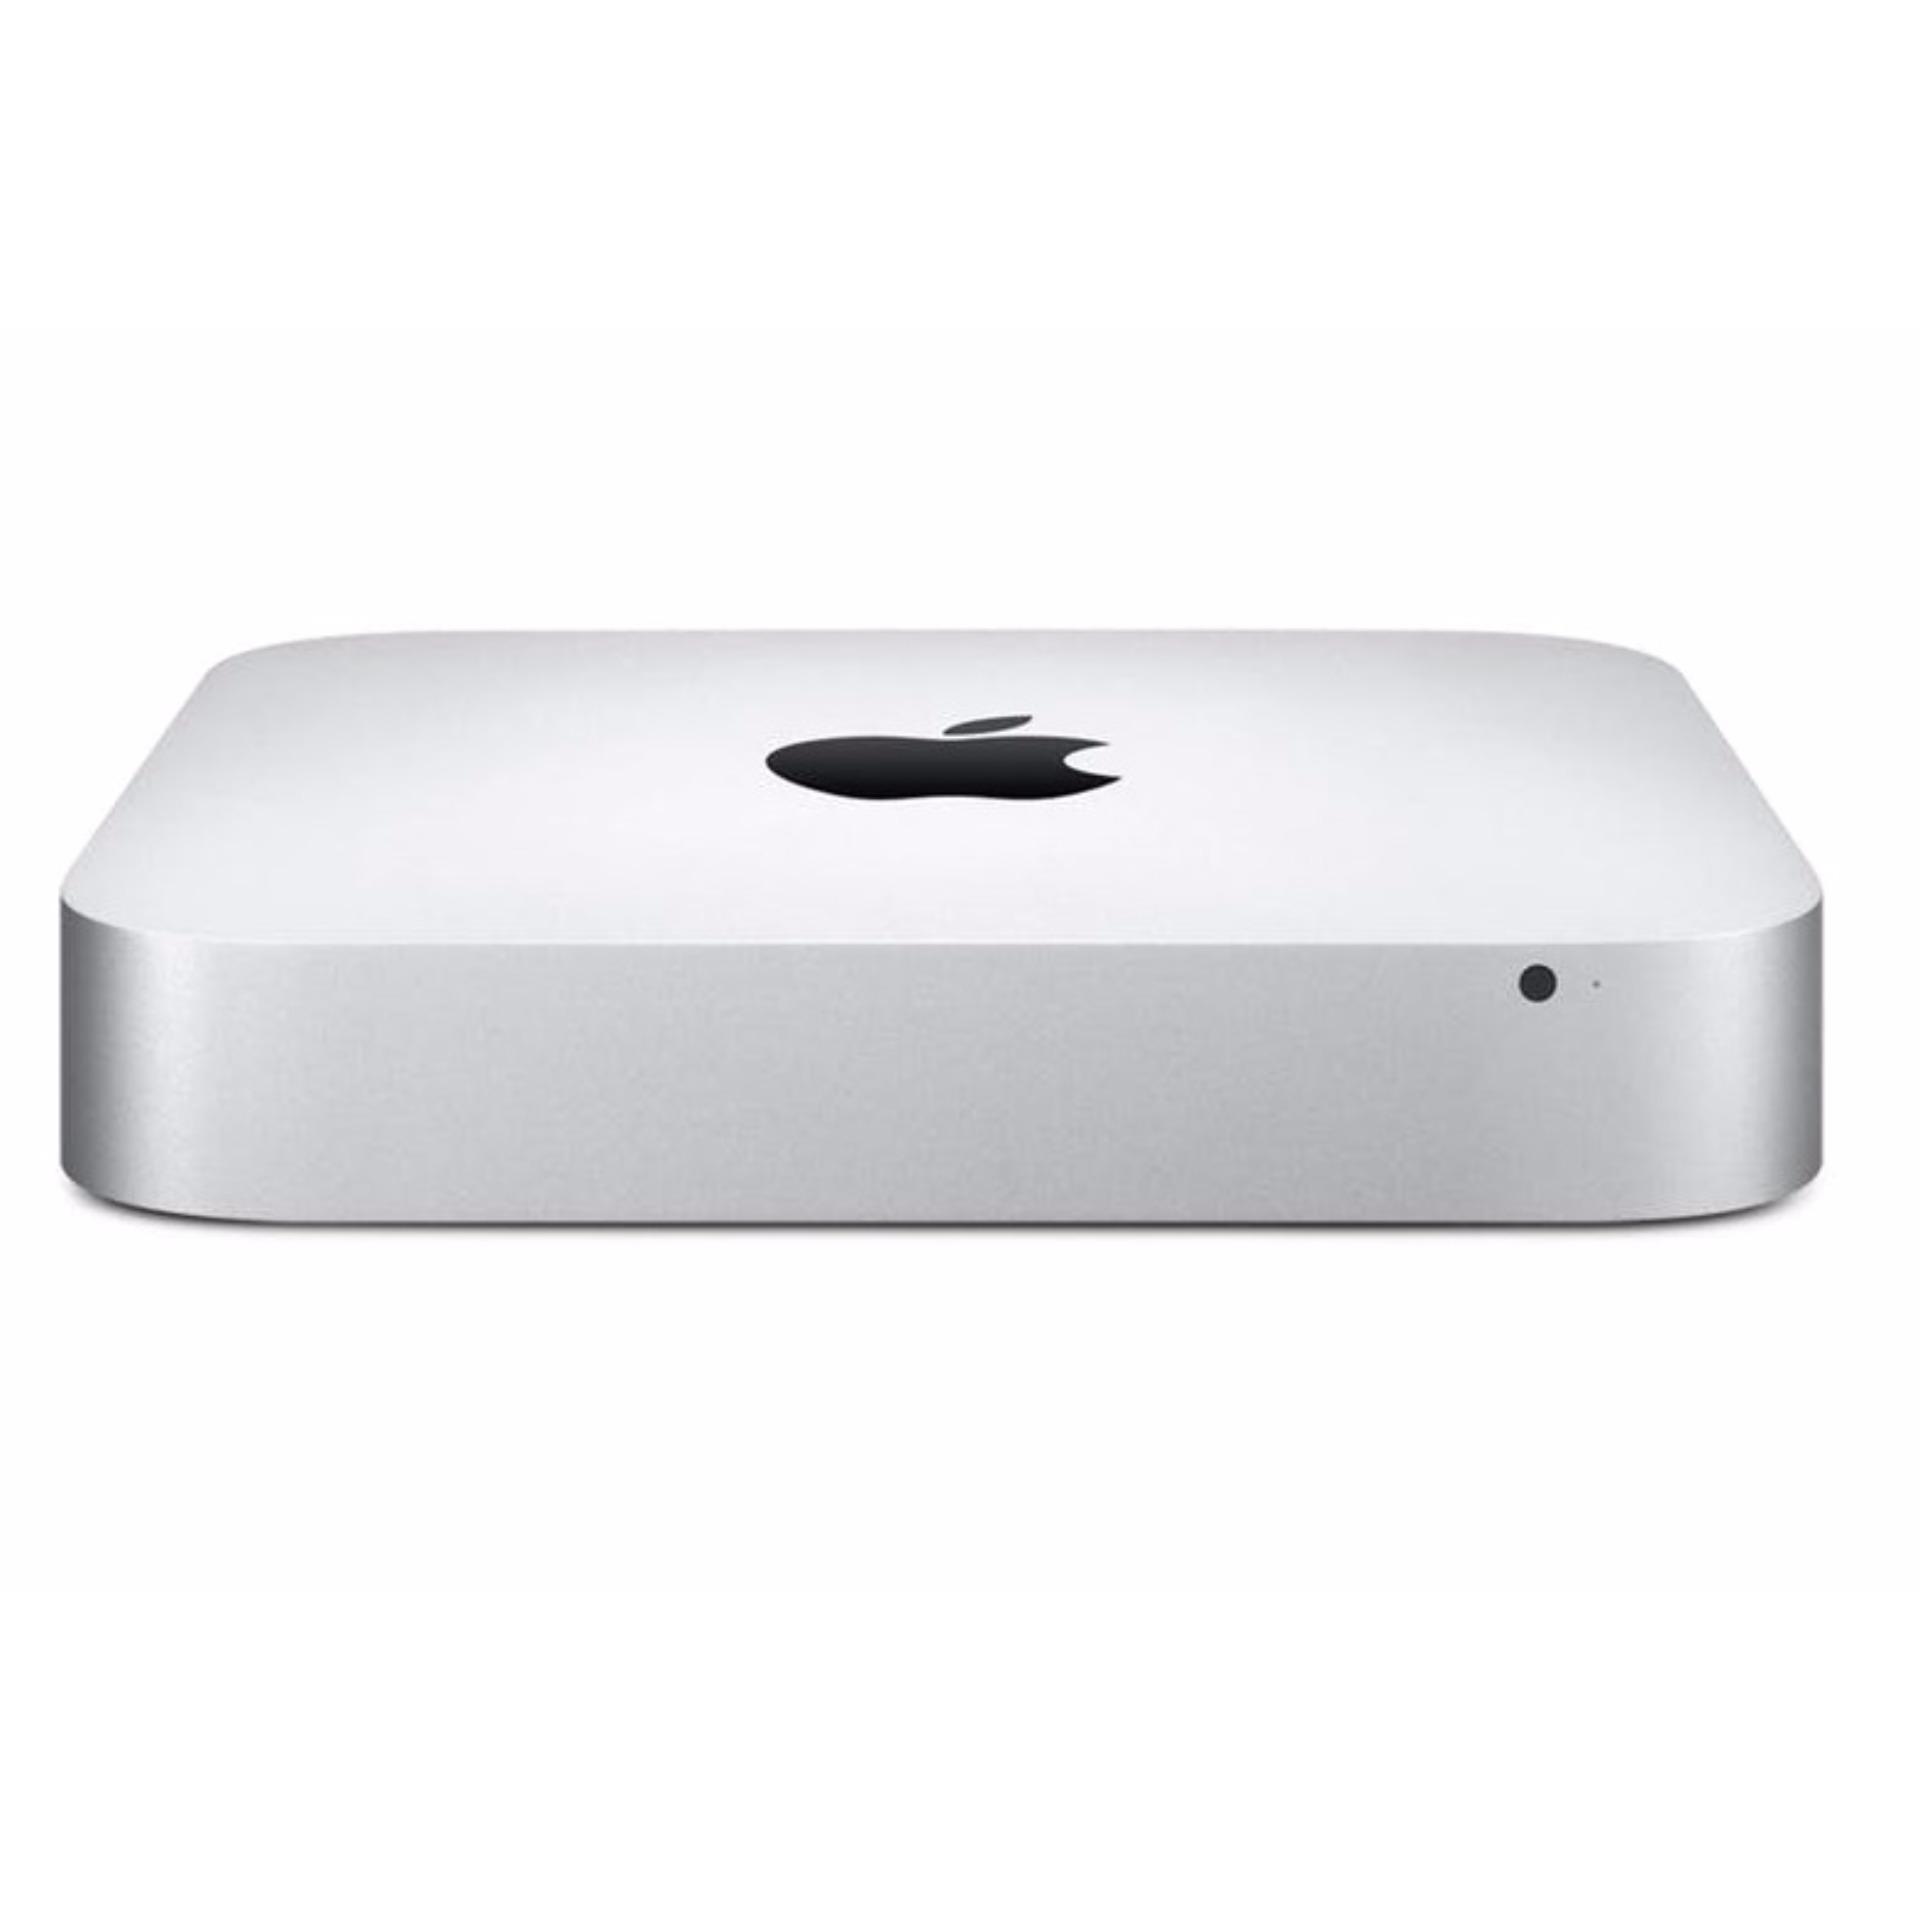 Apple Mac mini: 2.6GHz dual-core Intel Core i5